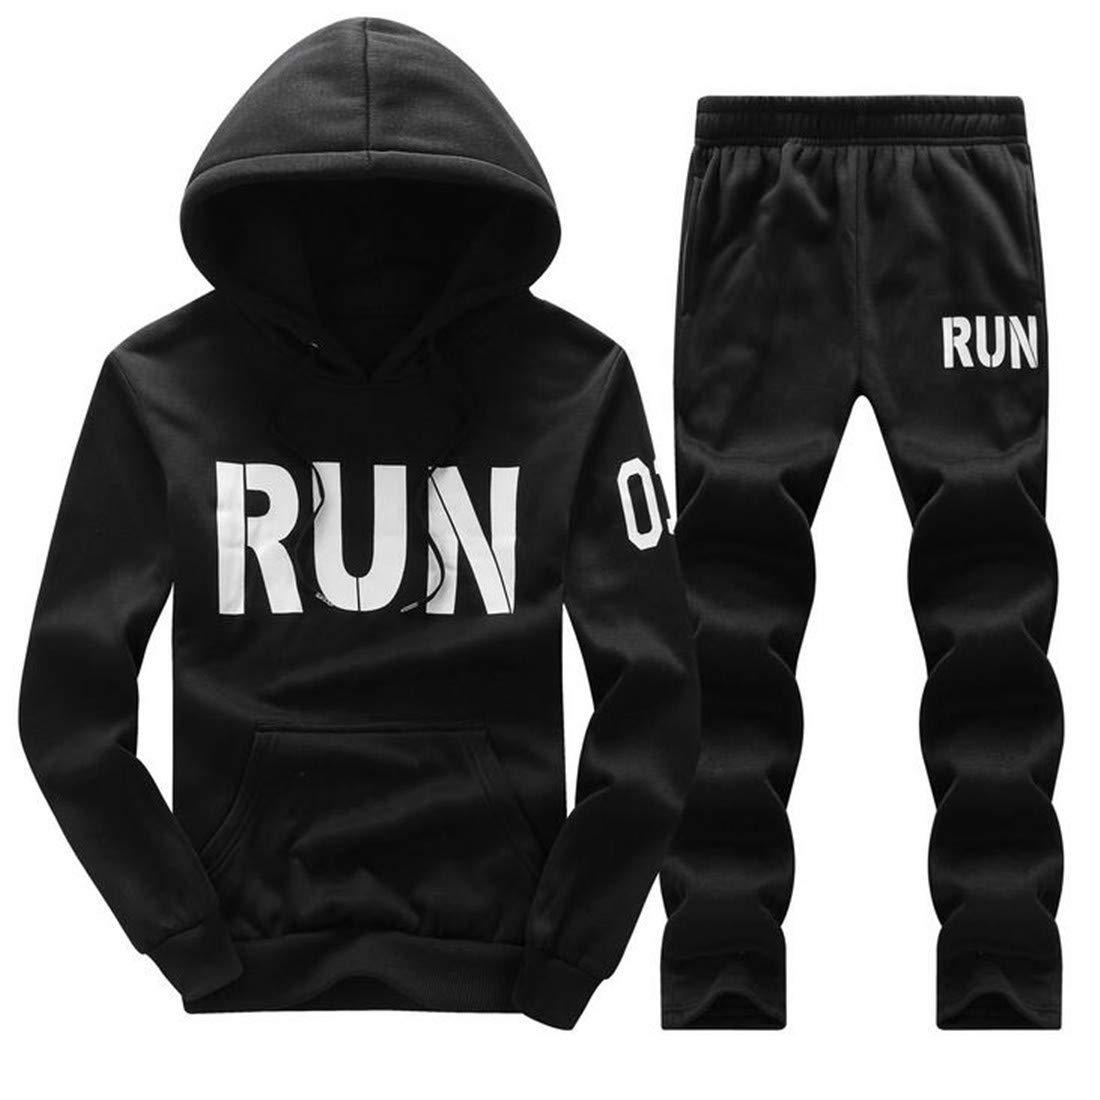 01d0dda8e Black Domple Domple Domple Mens Hooded Sweatsuit Sweatpants Letter Print 2  Pcs Outfits Sport Tracksuits 6391af